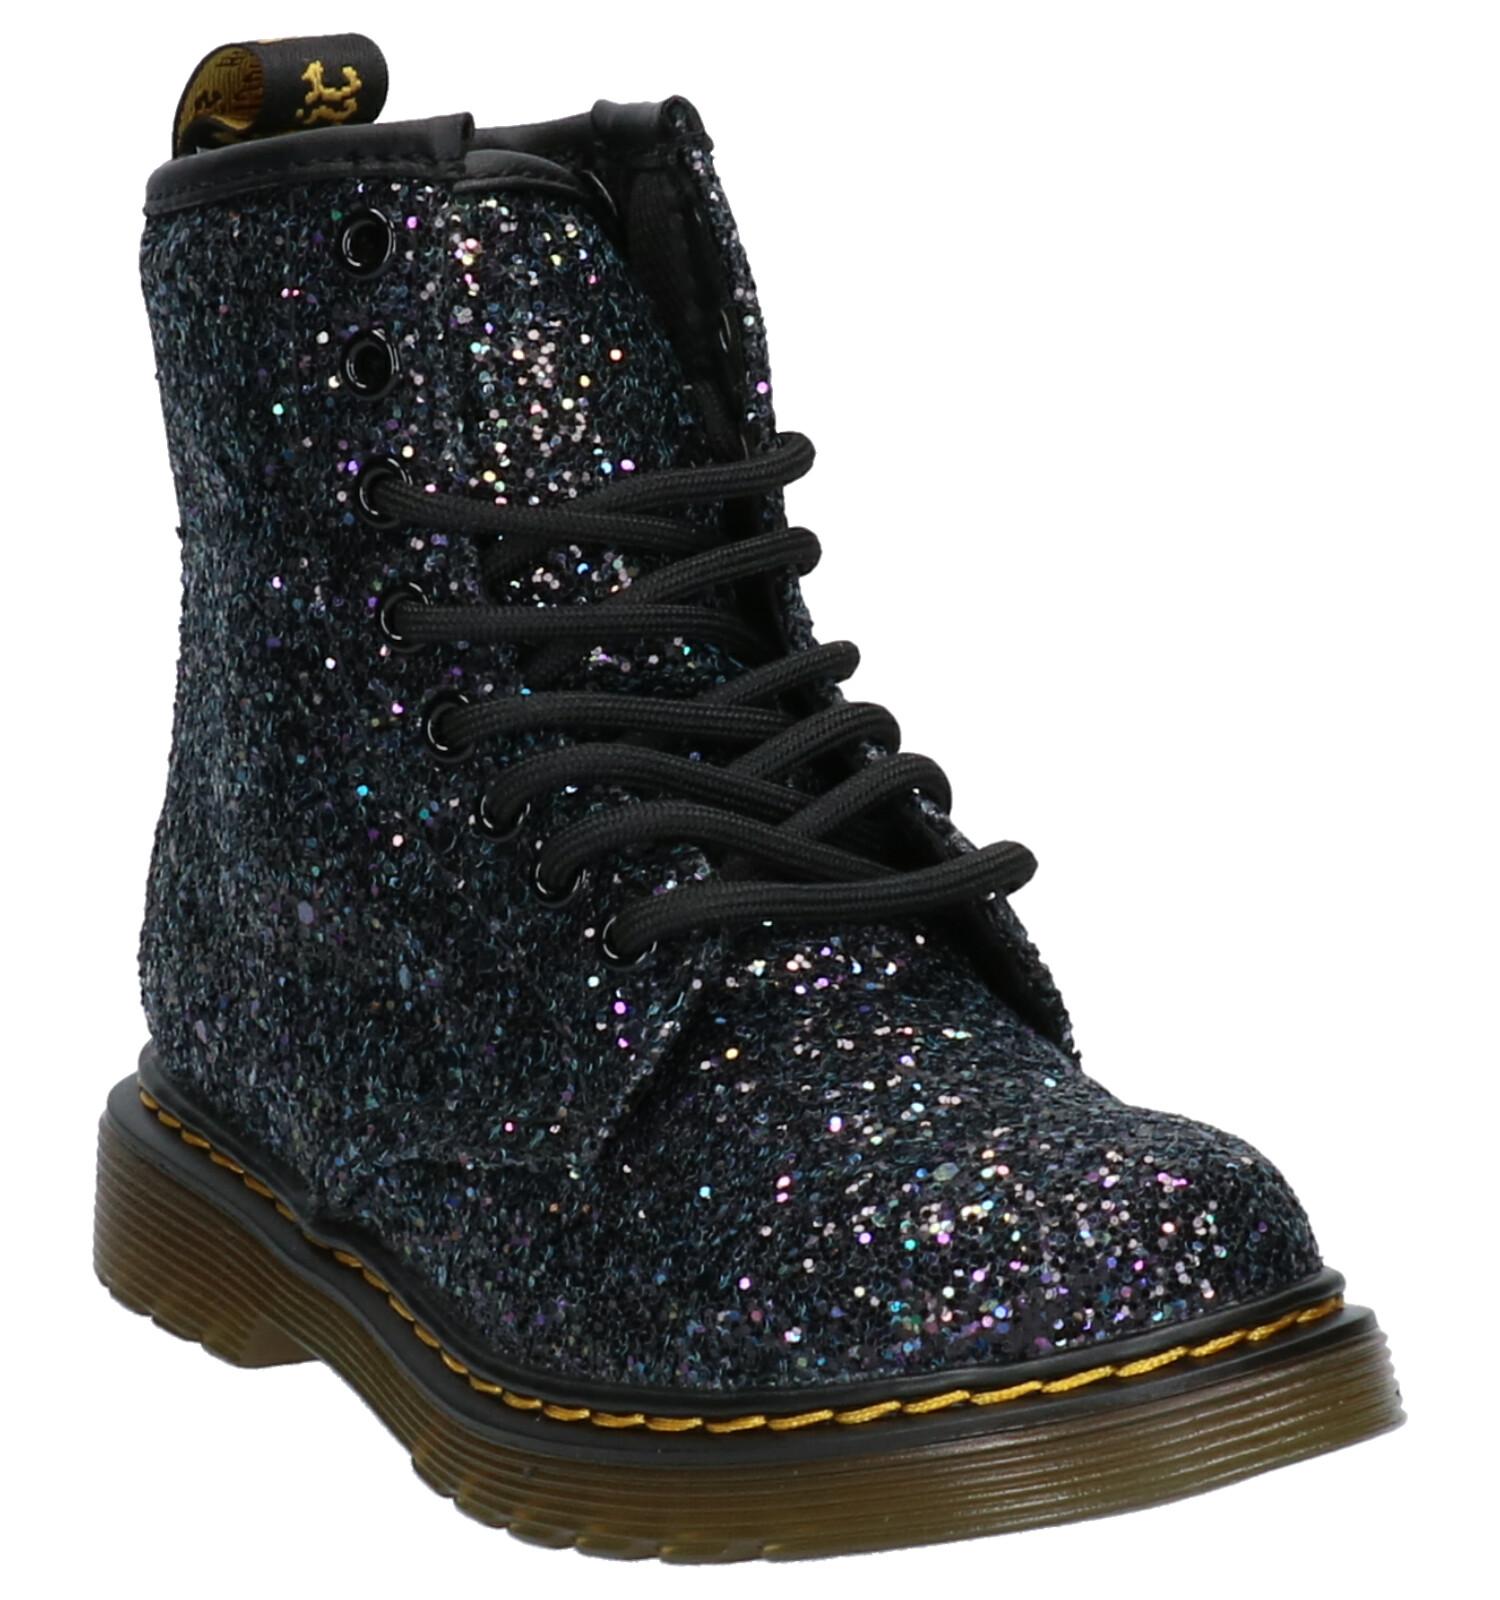 new design fantastic savings affordable price Dr. Martens Glitter Blauwe Boots | TORFS.BE | Gratis verzend ...